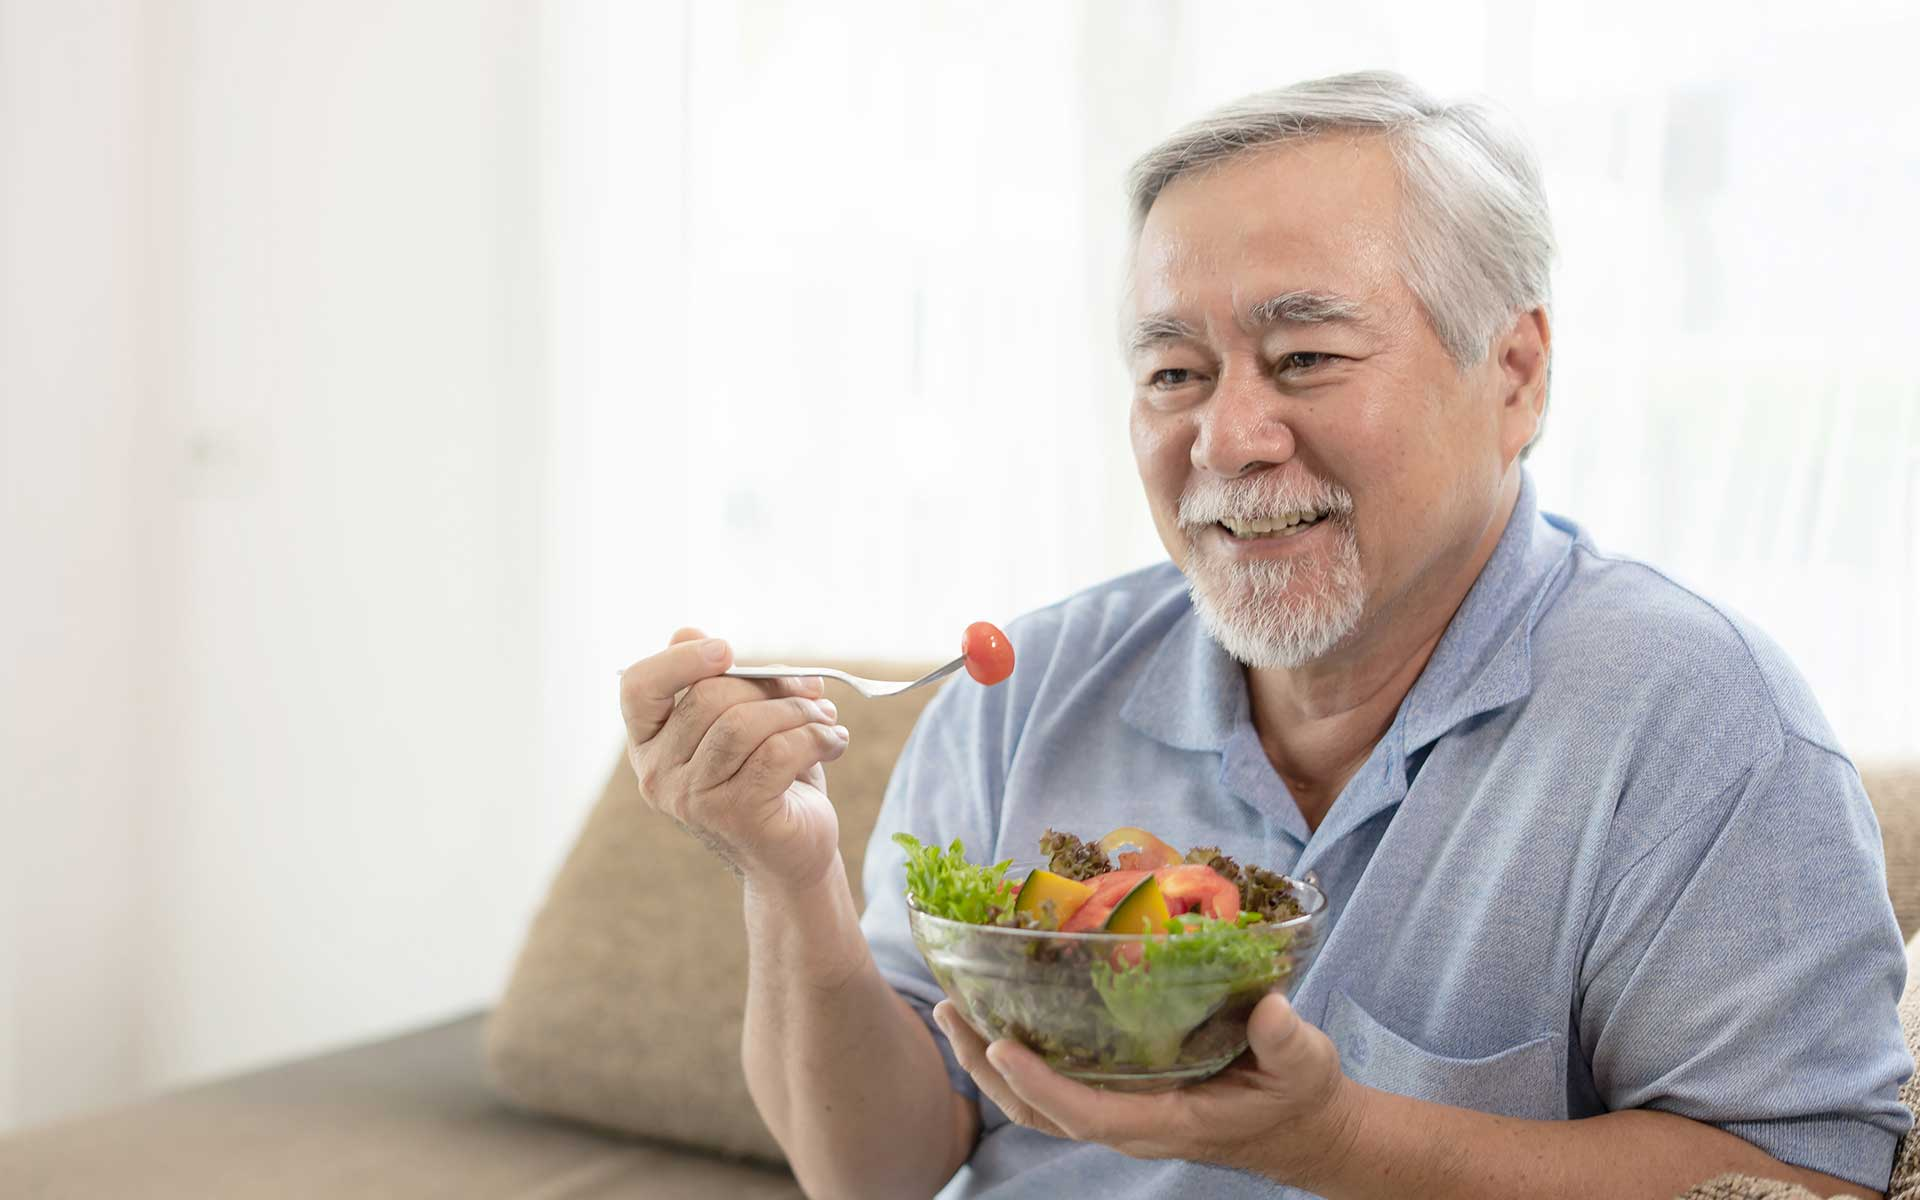 Stress prevention through a healthy diet